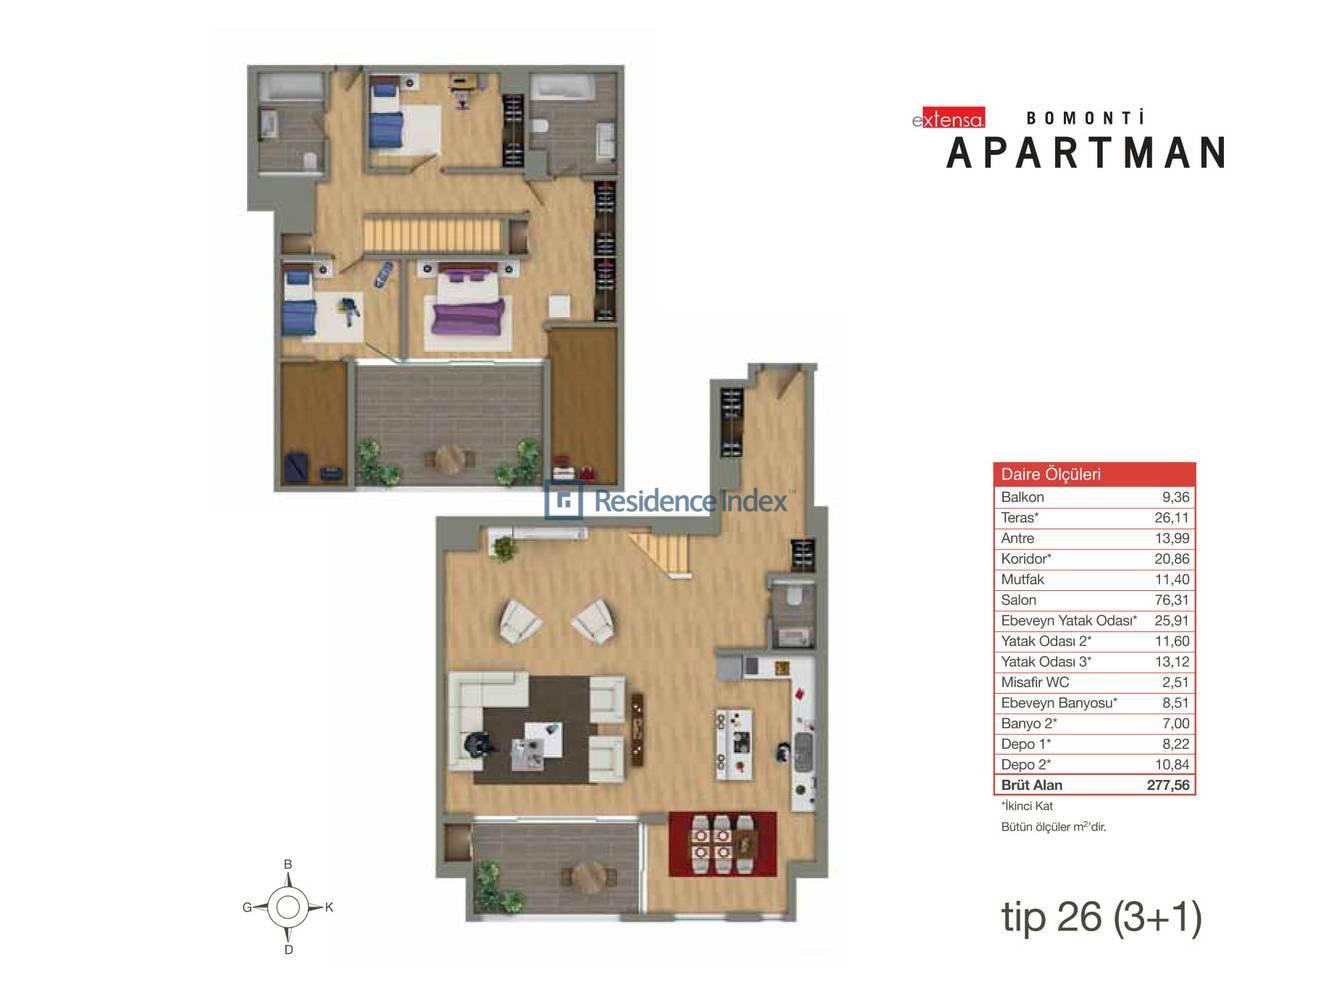 Bomonti Apartmanı Tip 26